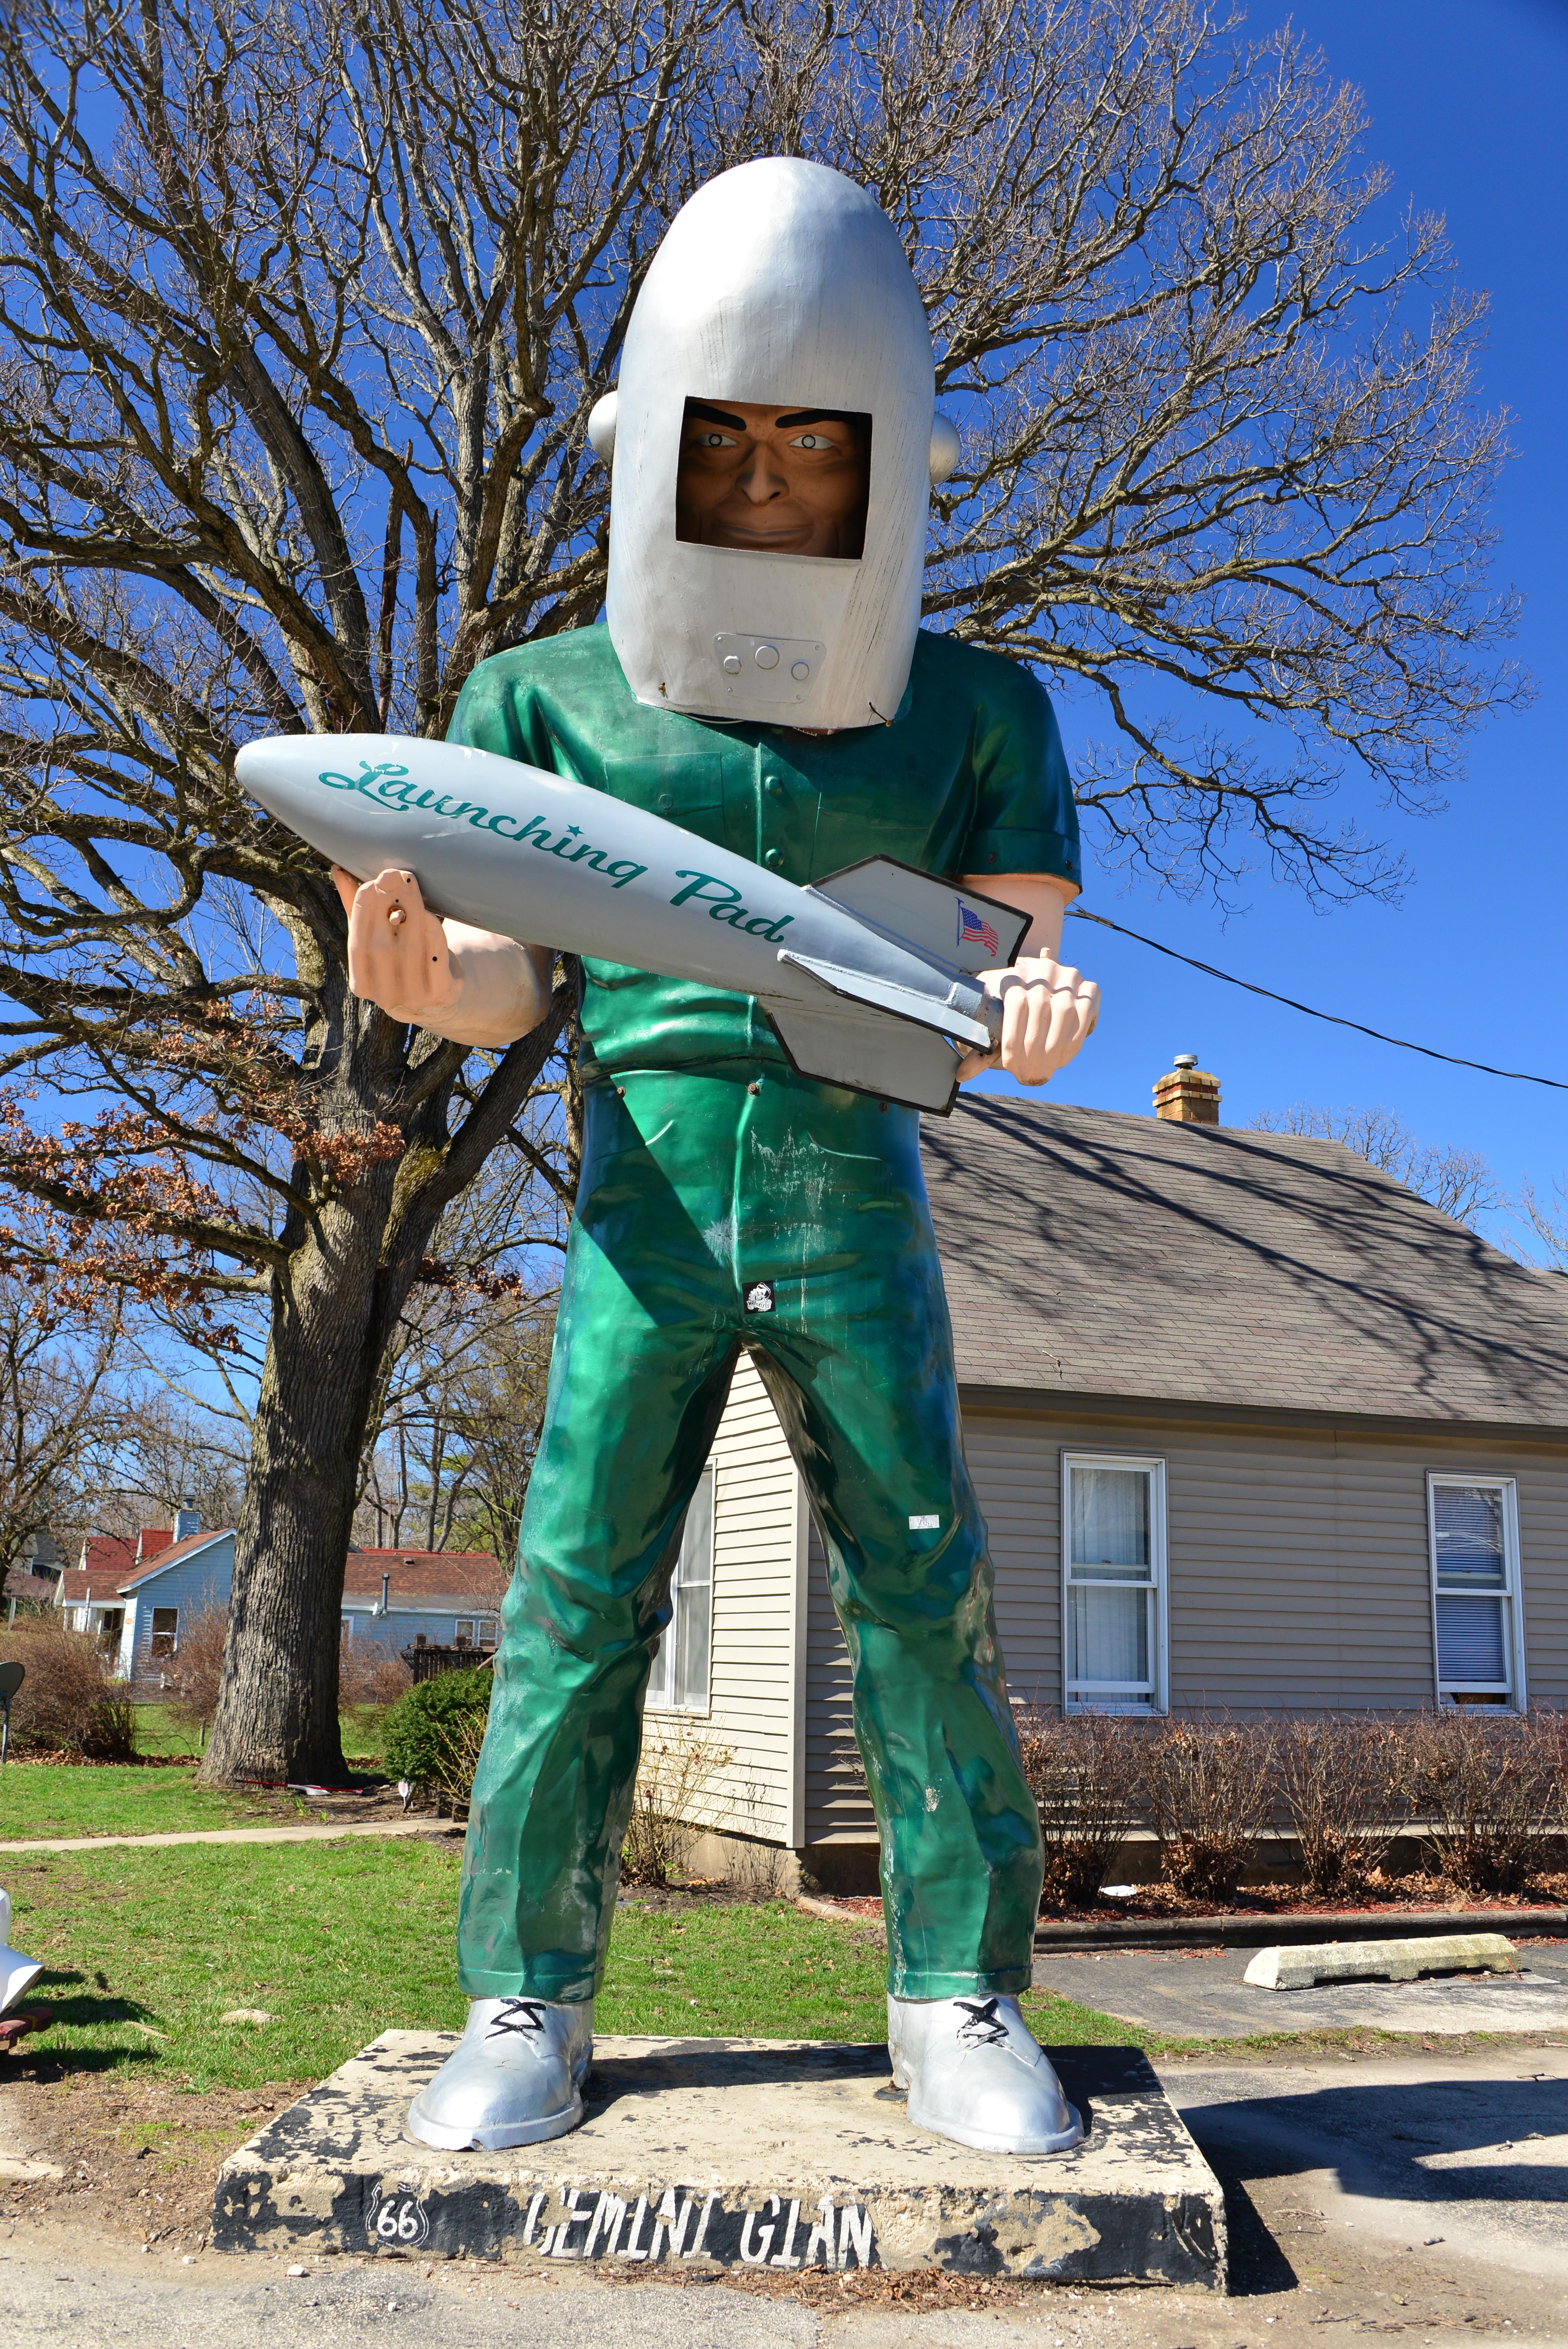 ... astronaut, sculpture, art, illinois, history, scarecrow, popular,  memorabilia, route 66, yesteryear, spaceman, mother road, wilmington,  gemini giant, ...